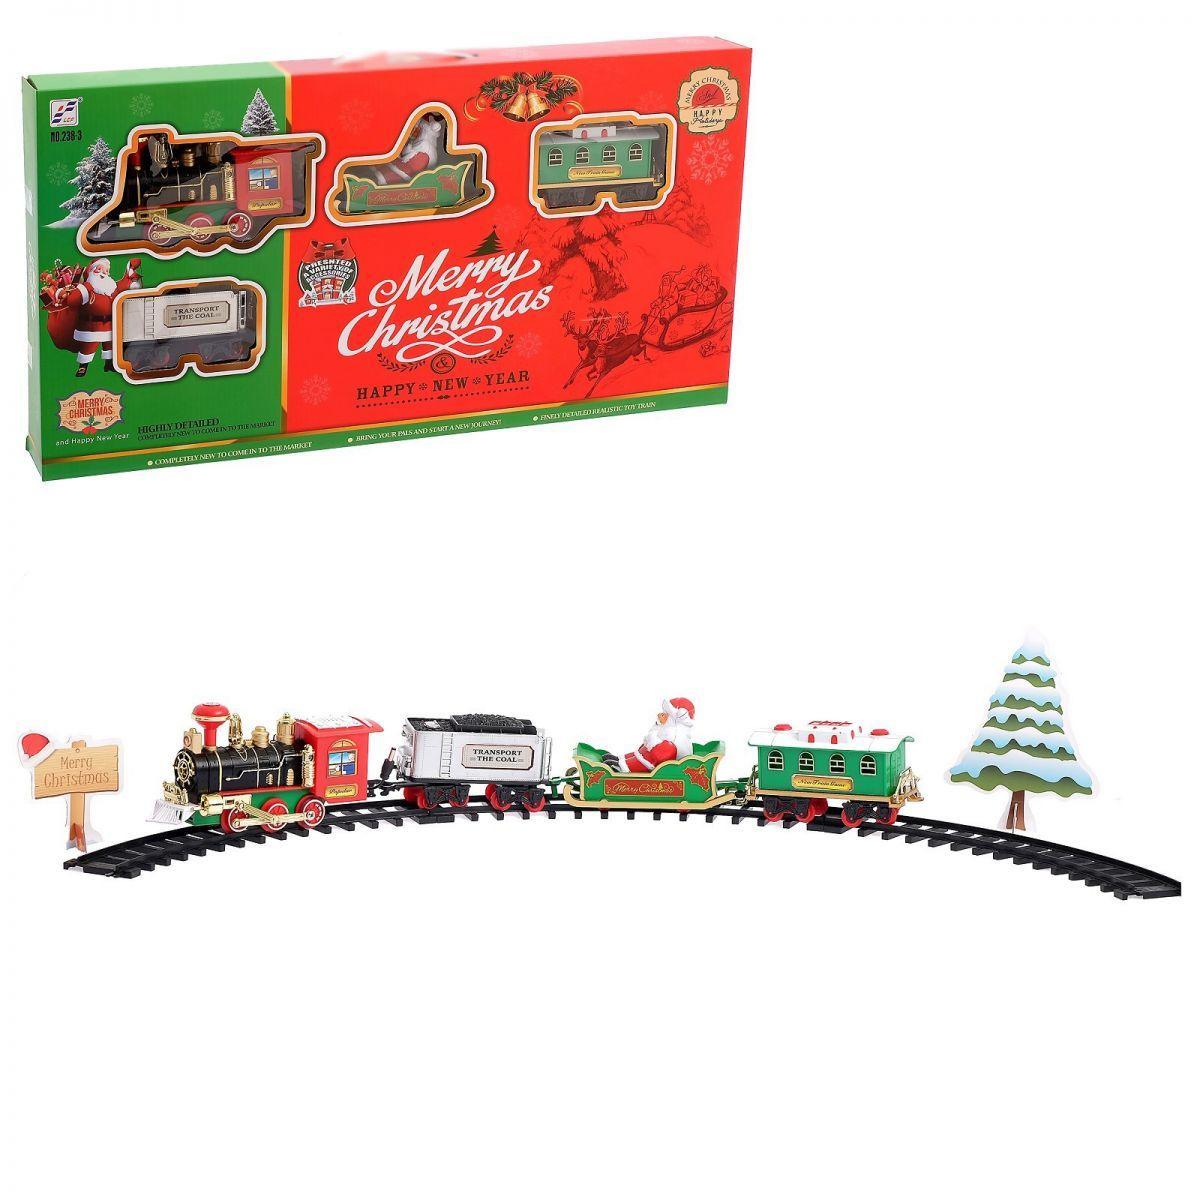 "Железная дорога ""MERRY CHRISTMAS"" 238-3, свет, звук"